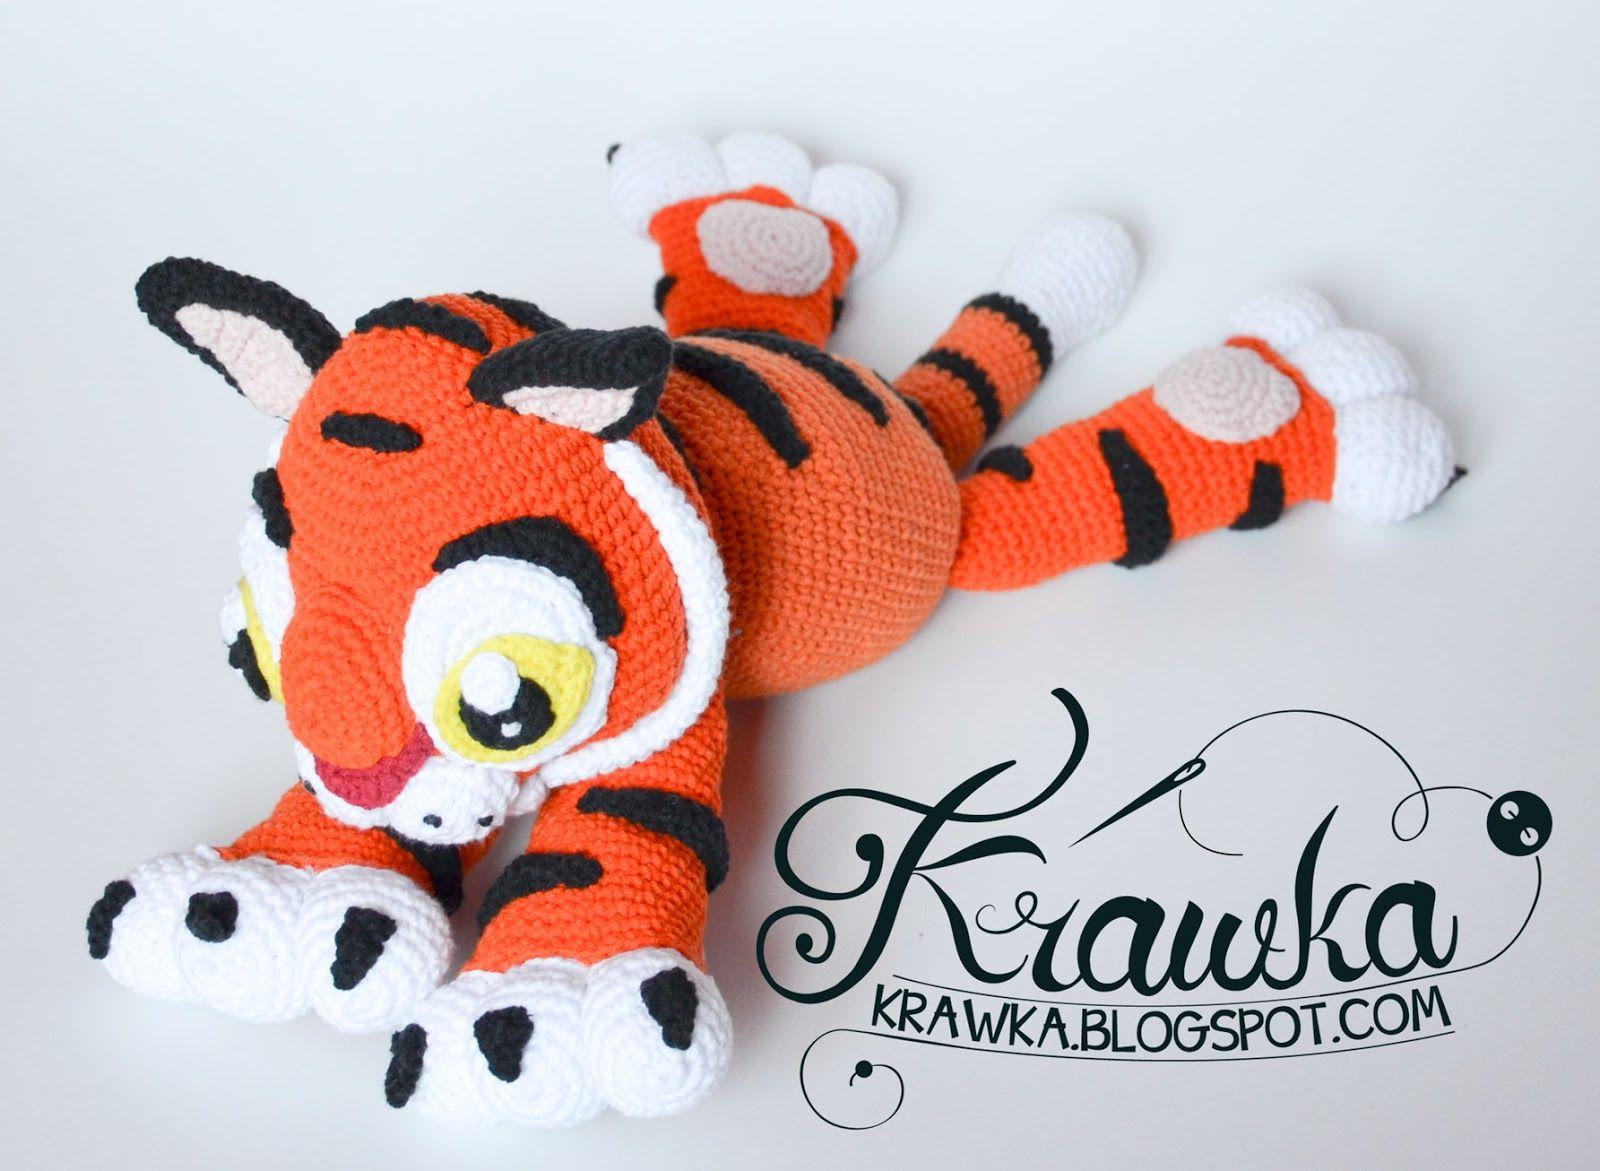 Free Amigurumi Disney Patterns : Krawka: baby tiger rajah crochet pattern inspired on tiger character